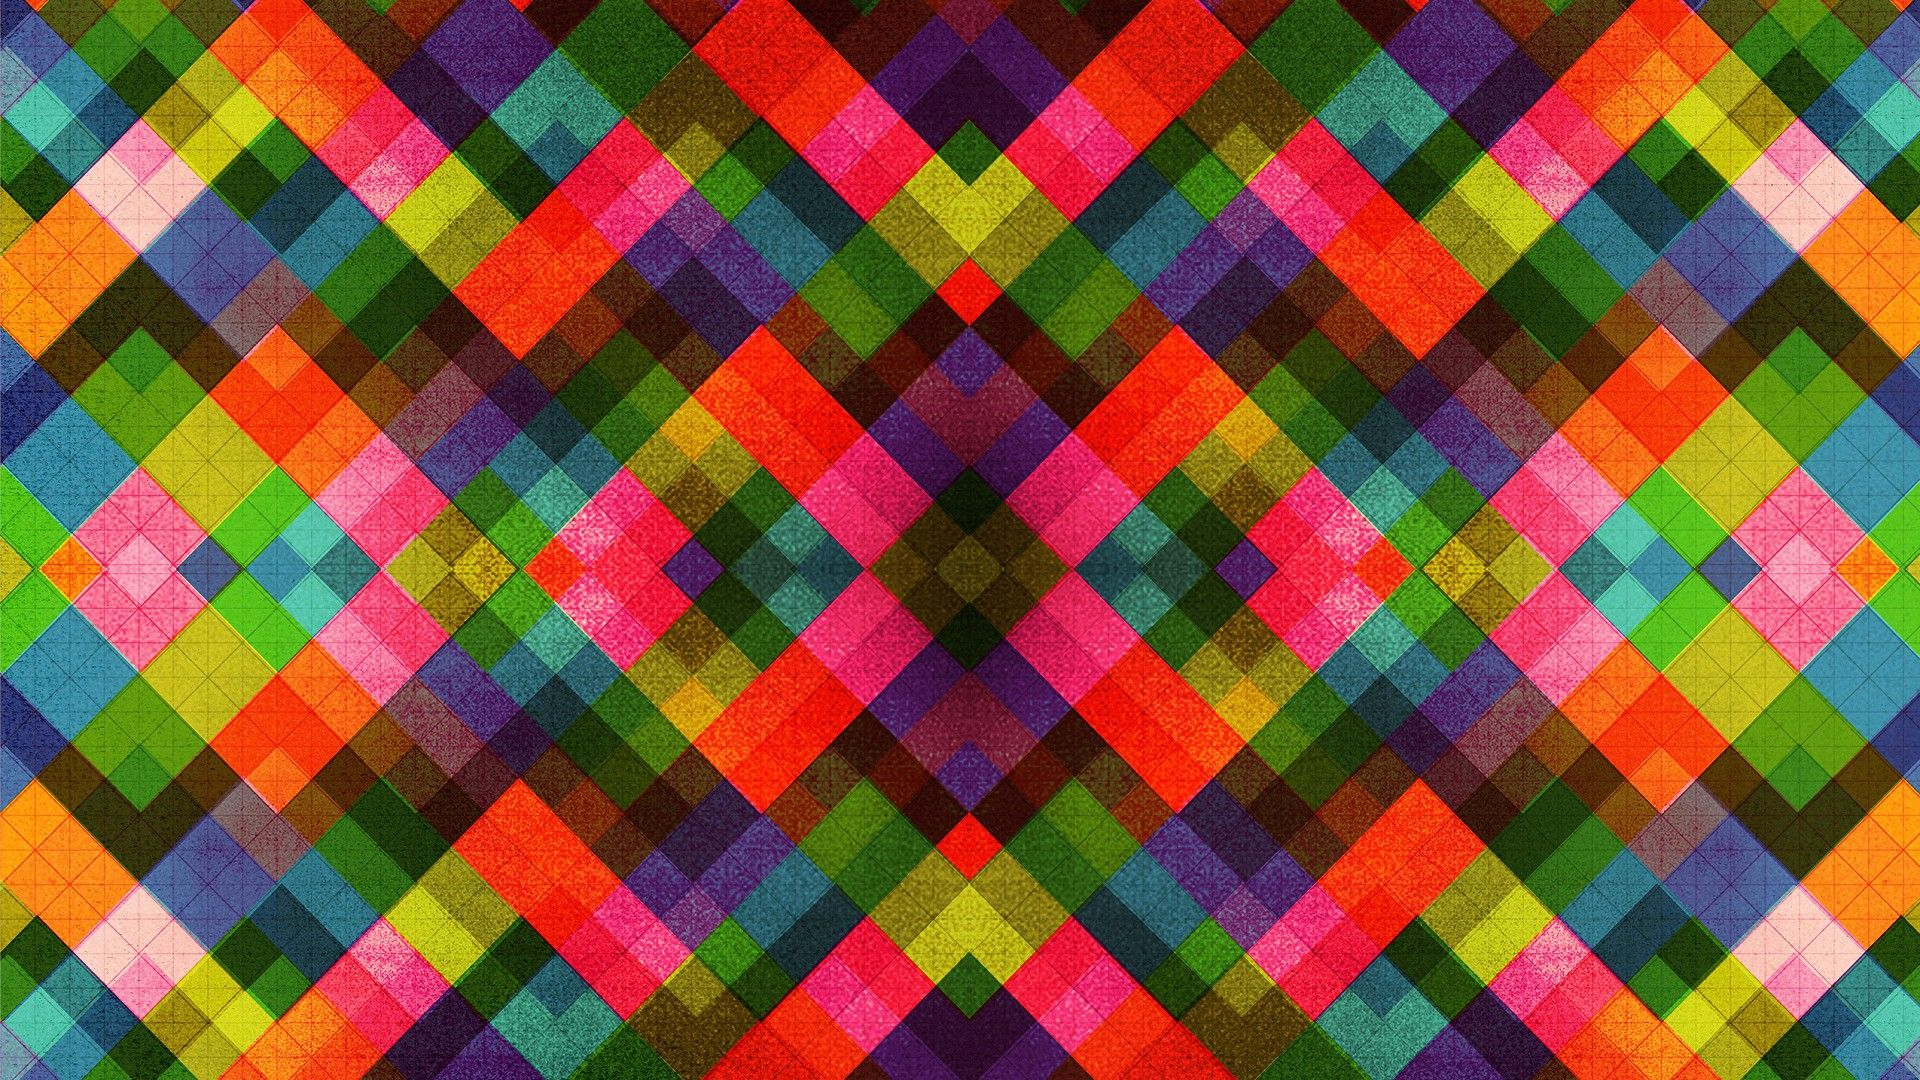 Hd Colorful Wallpaper